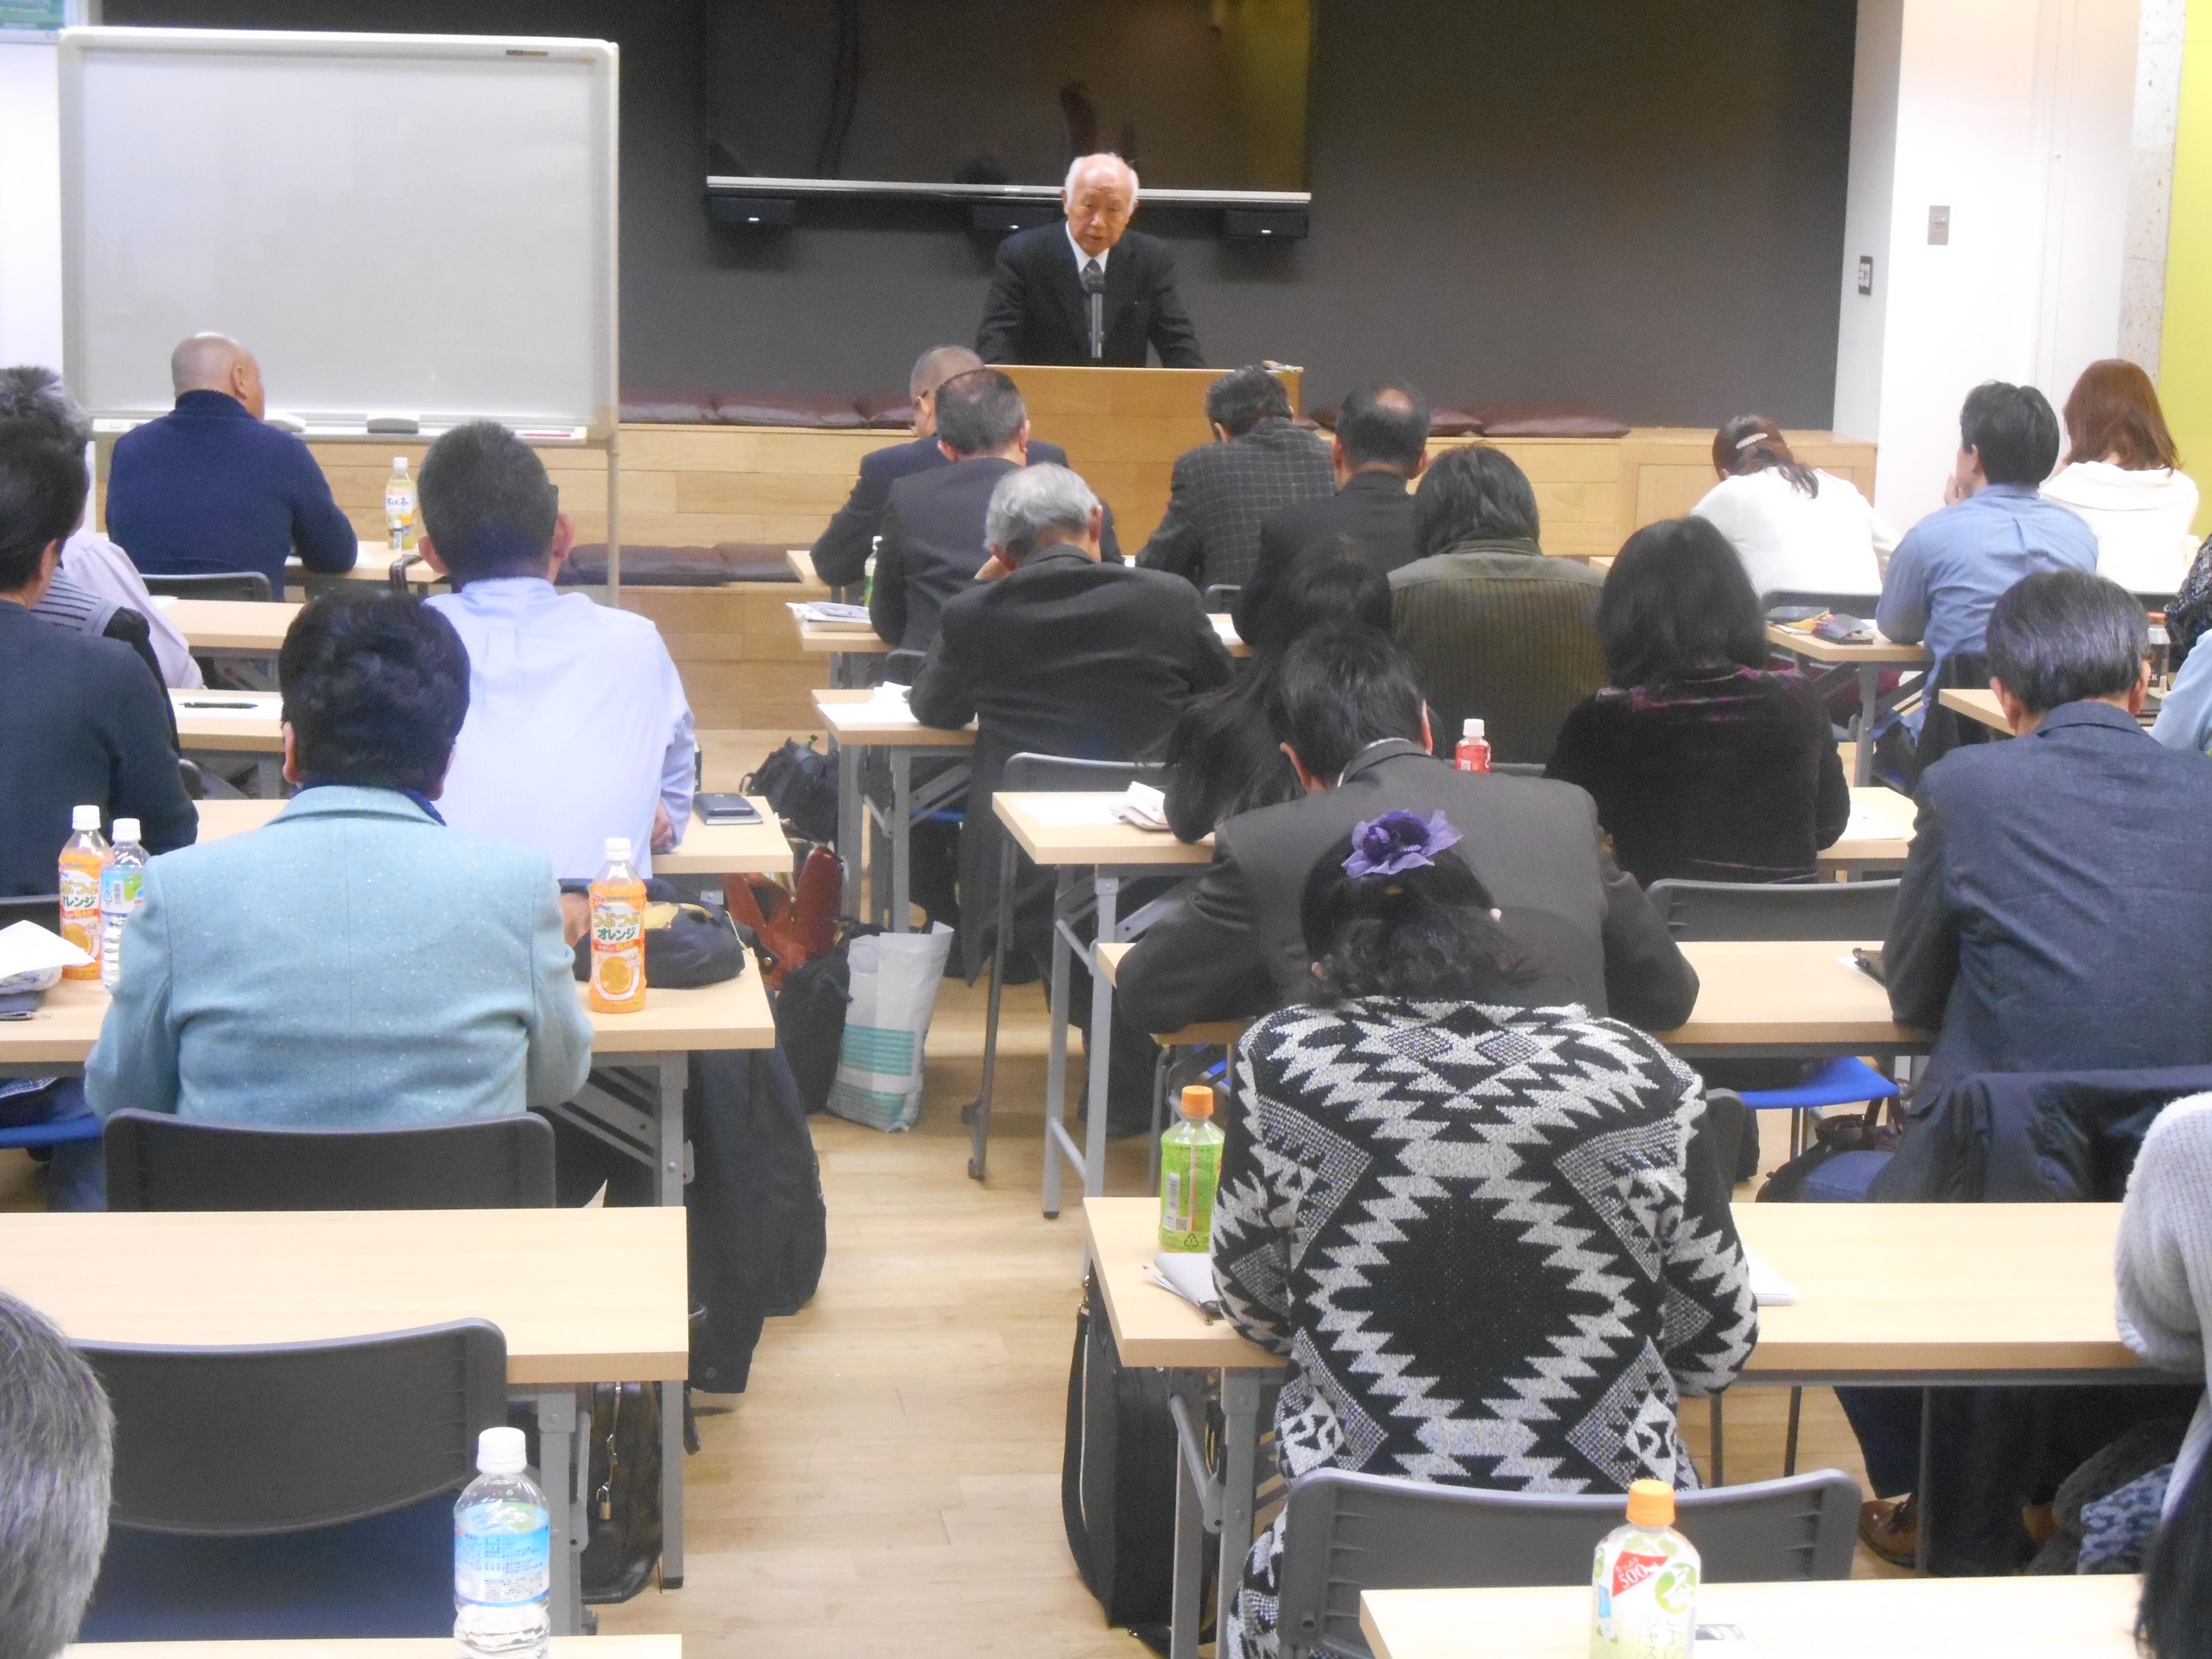 DSCN0054 - 4月1日東京思風塾の開催になります。